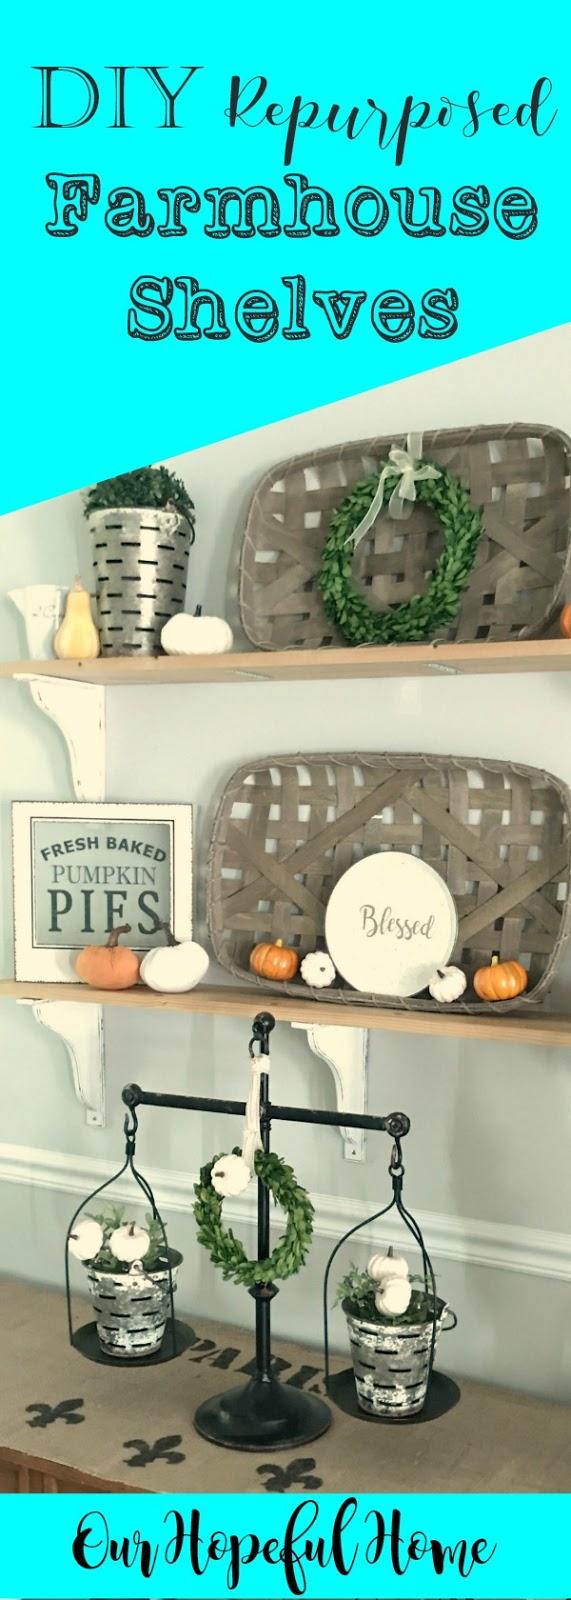 fall decor tobacco basket boxwood wreath velvet pumpkins pie sign shelves white corbels vintage scales